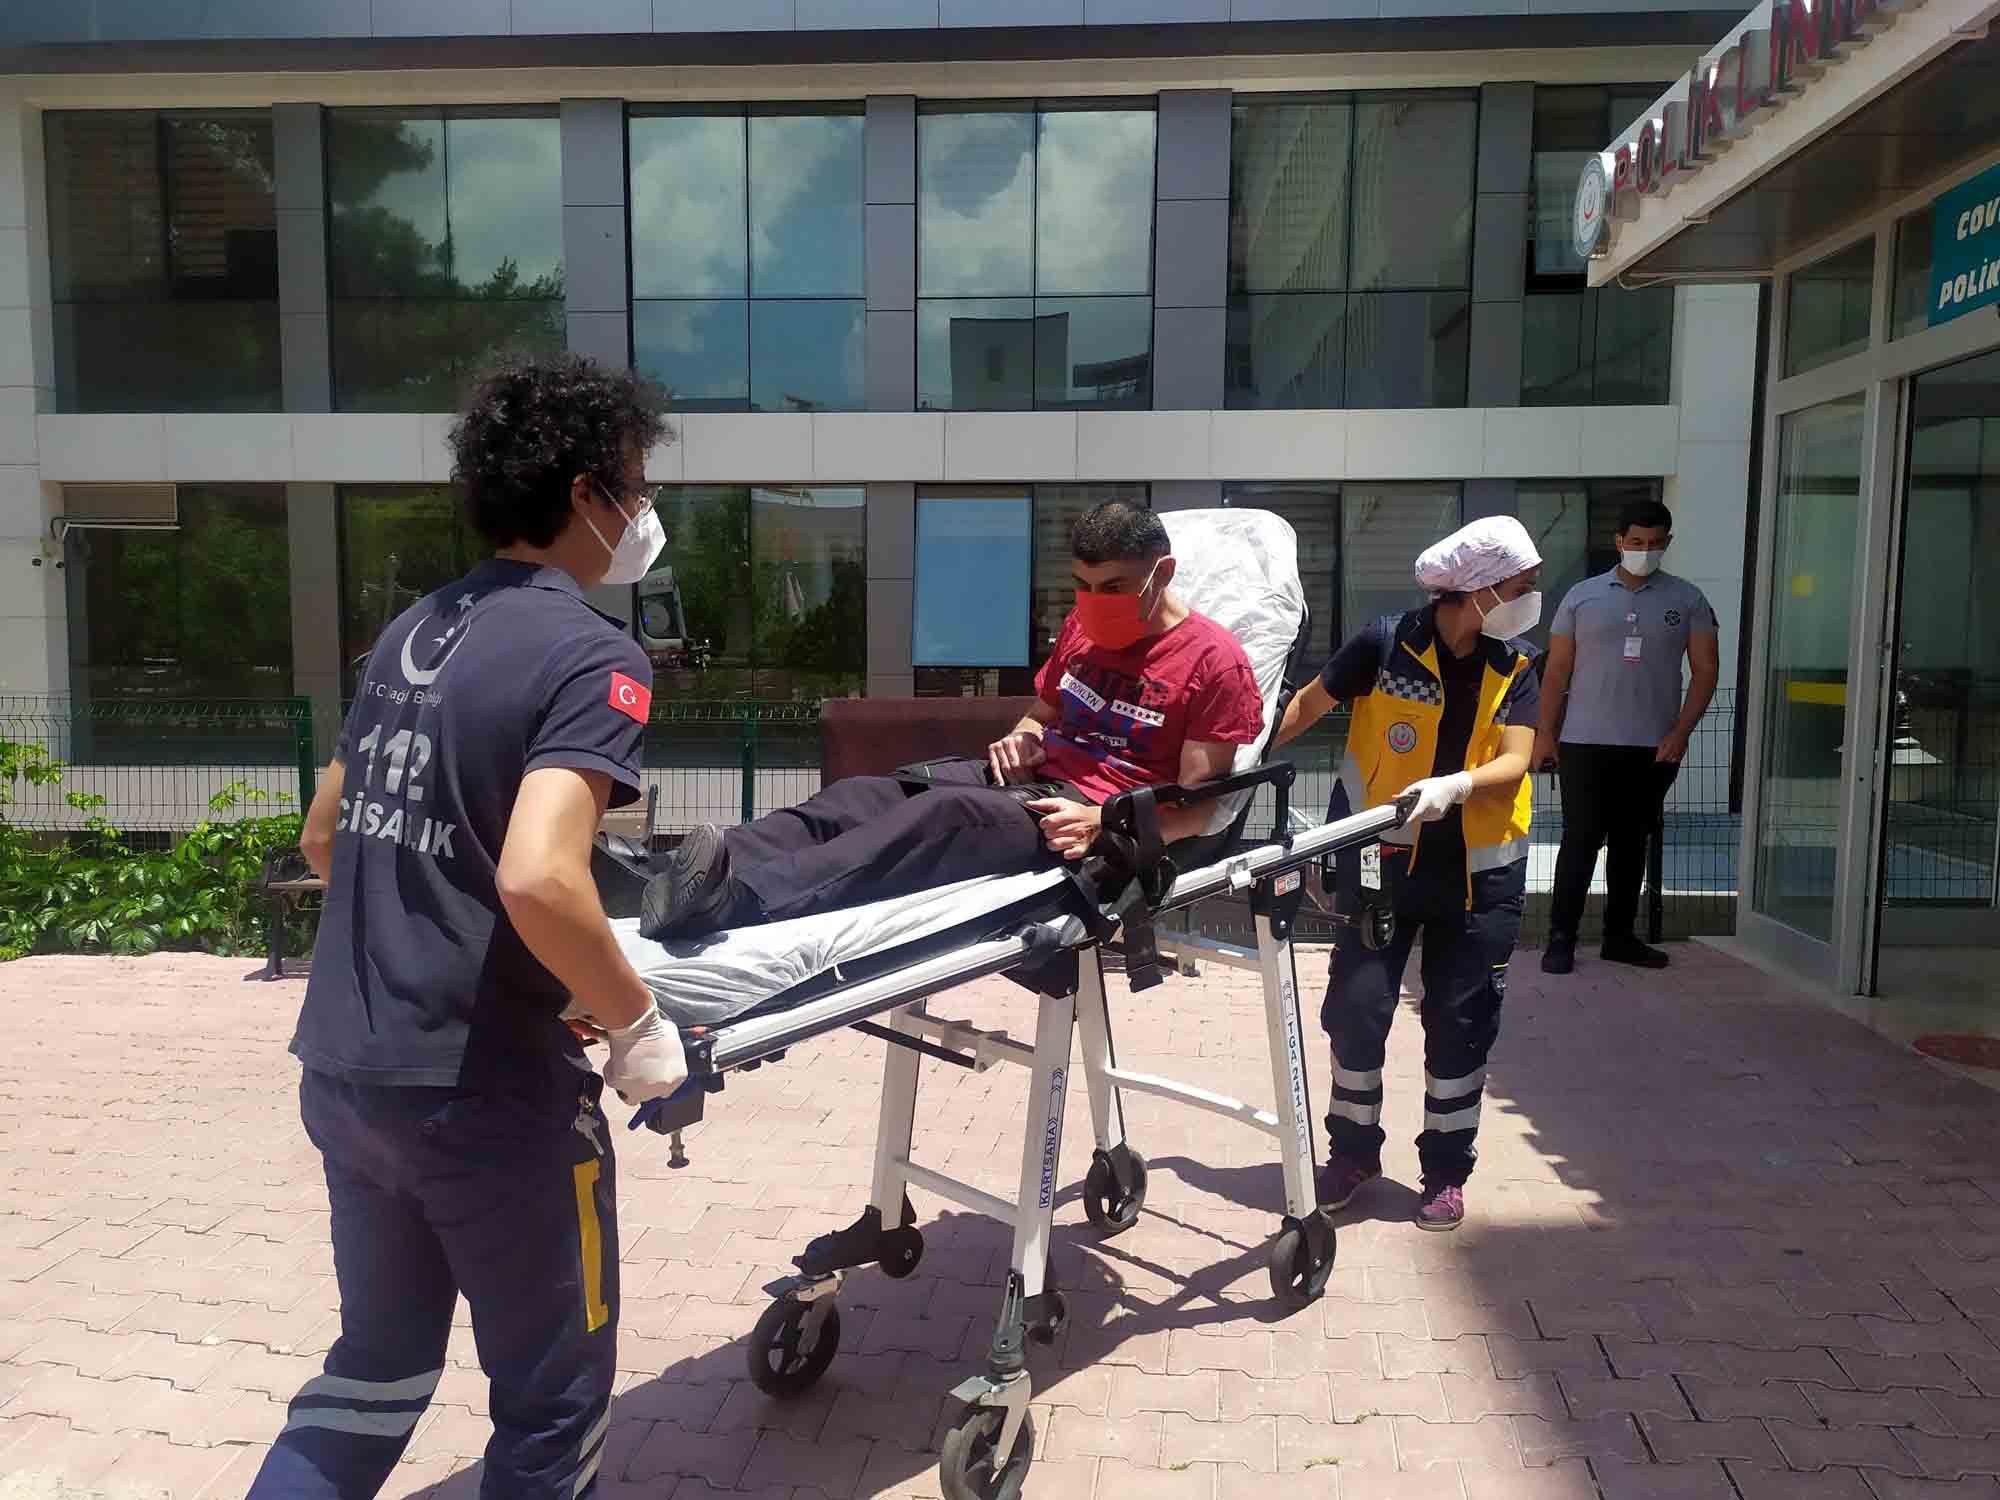 asi-calismalarinda-evden-hastaneye-asi-hizmeti-002.jpg